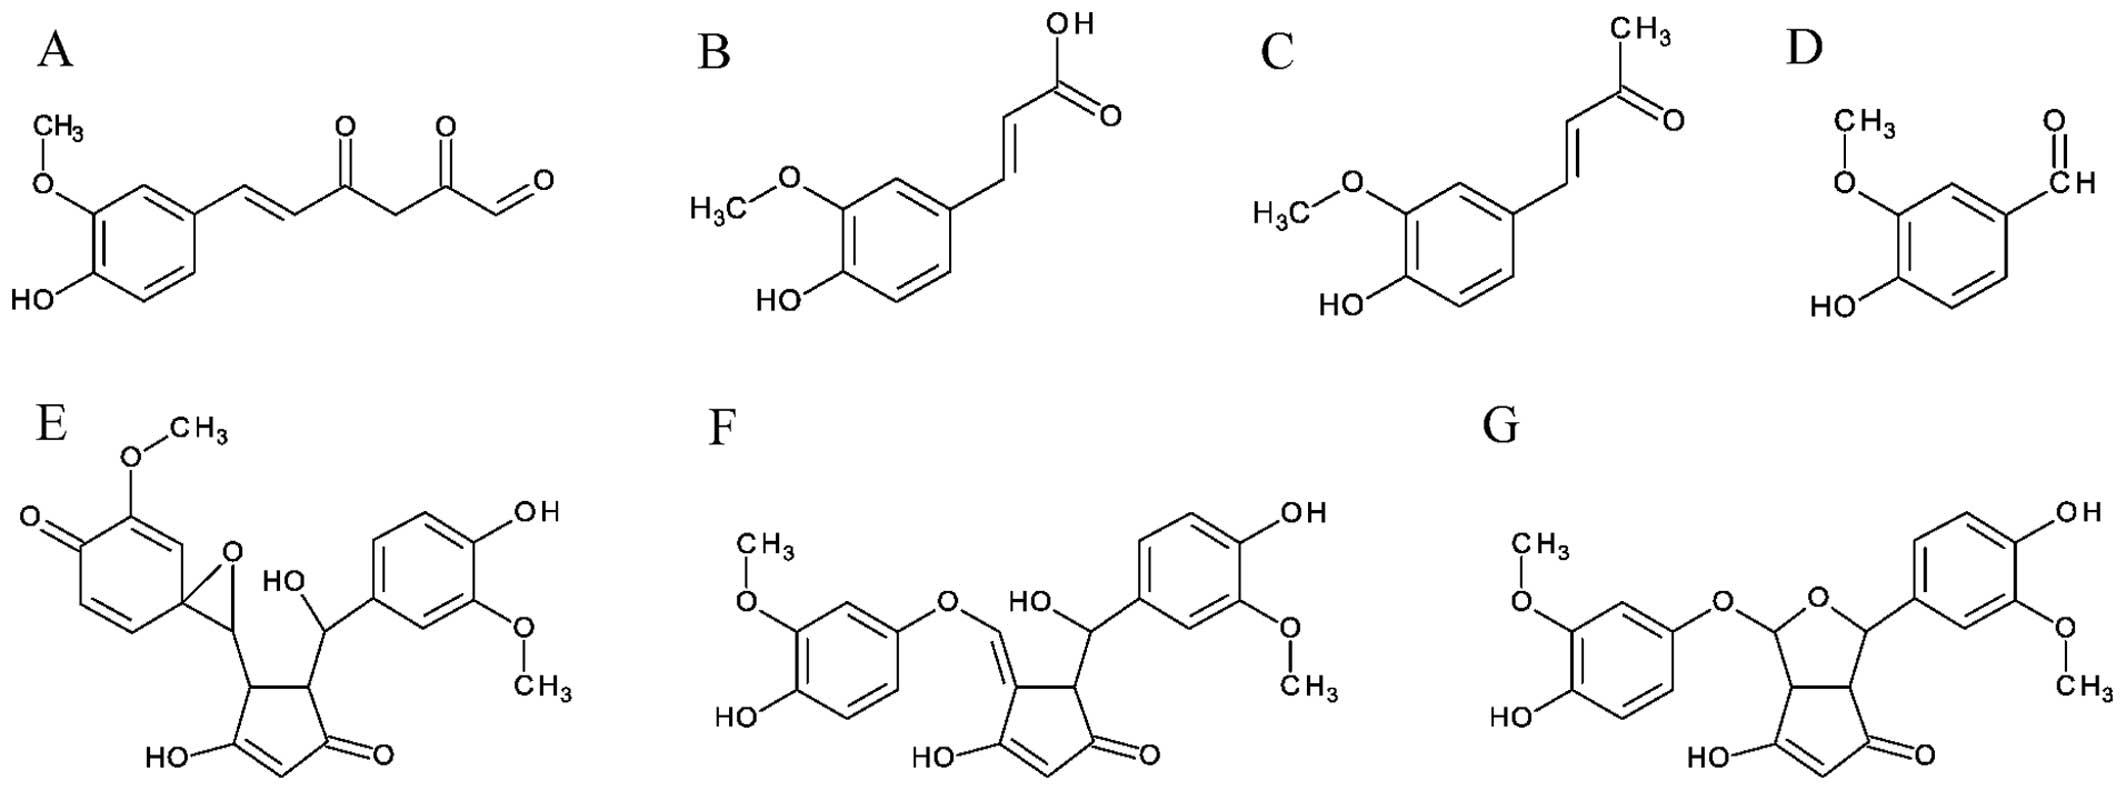 Determining whether curcumin degradation/condensation is